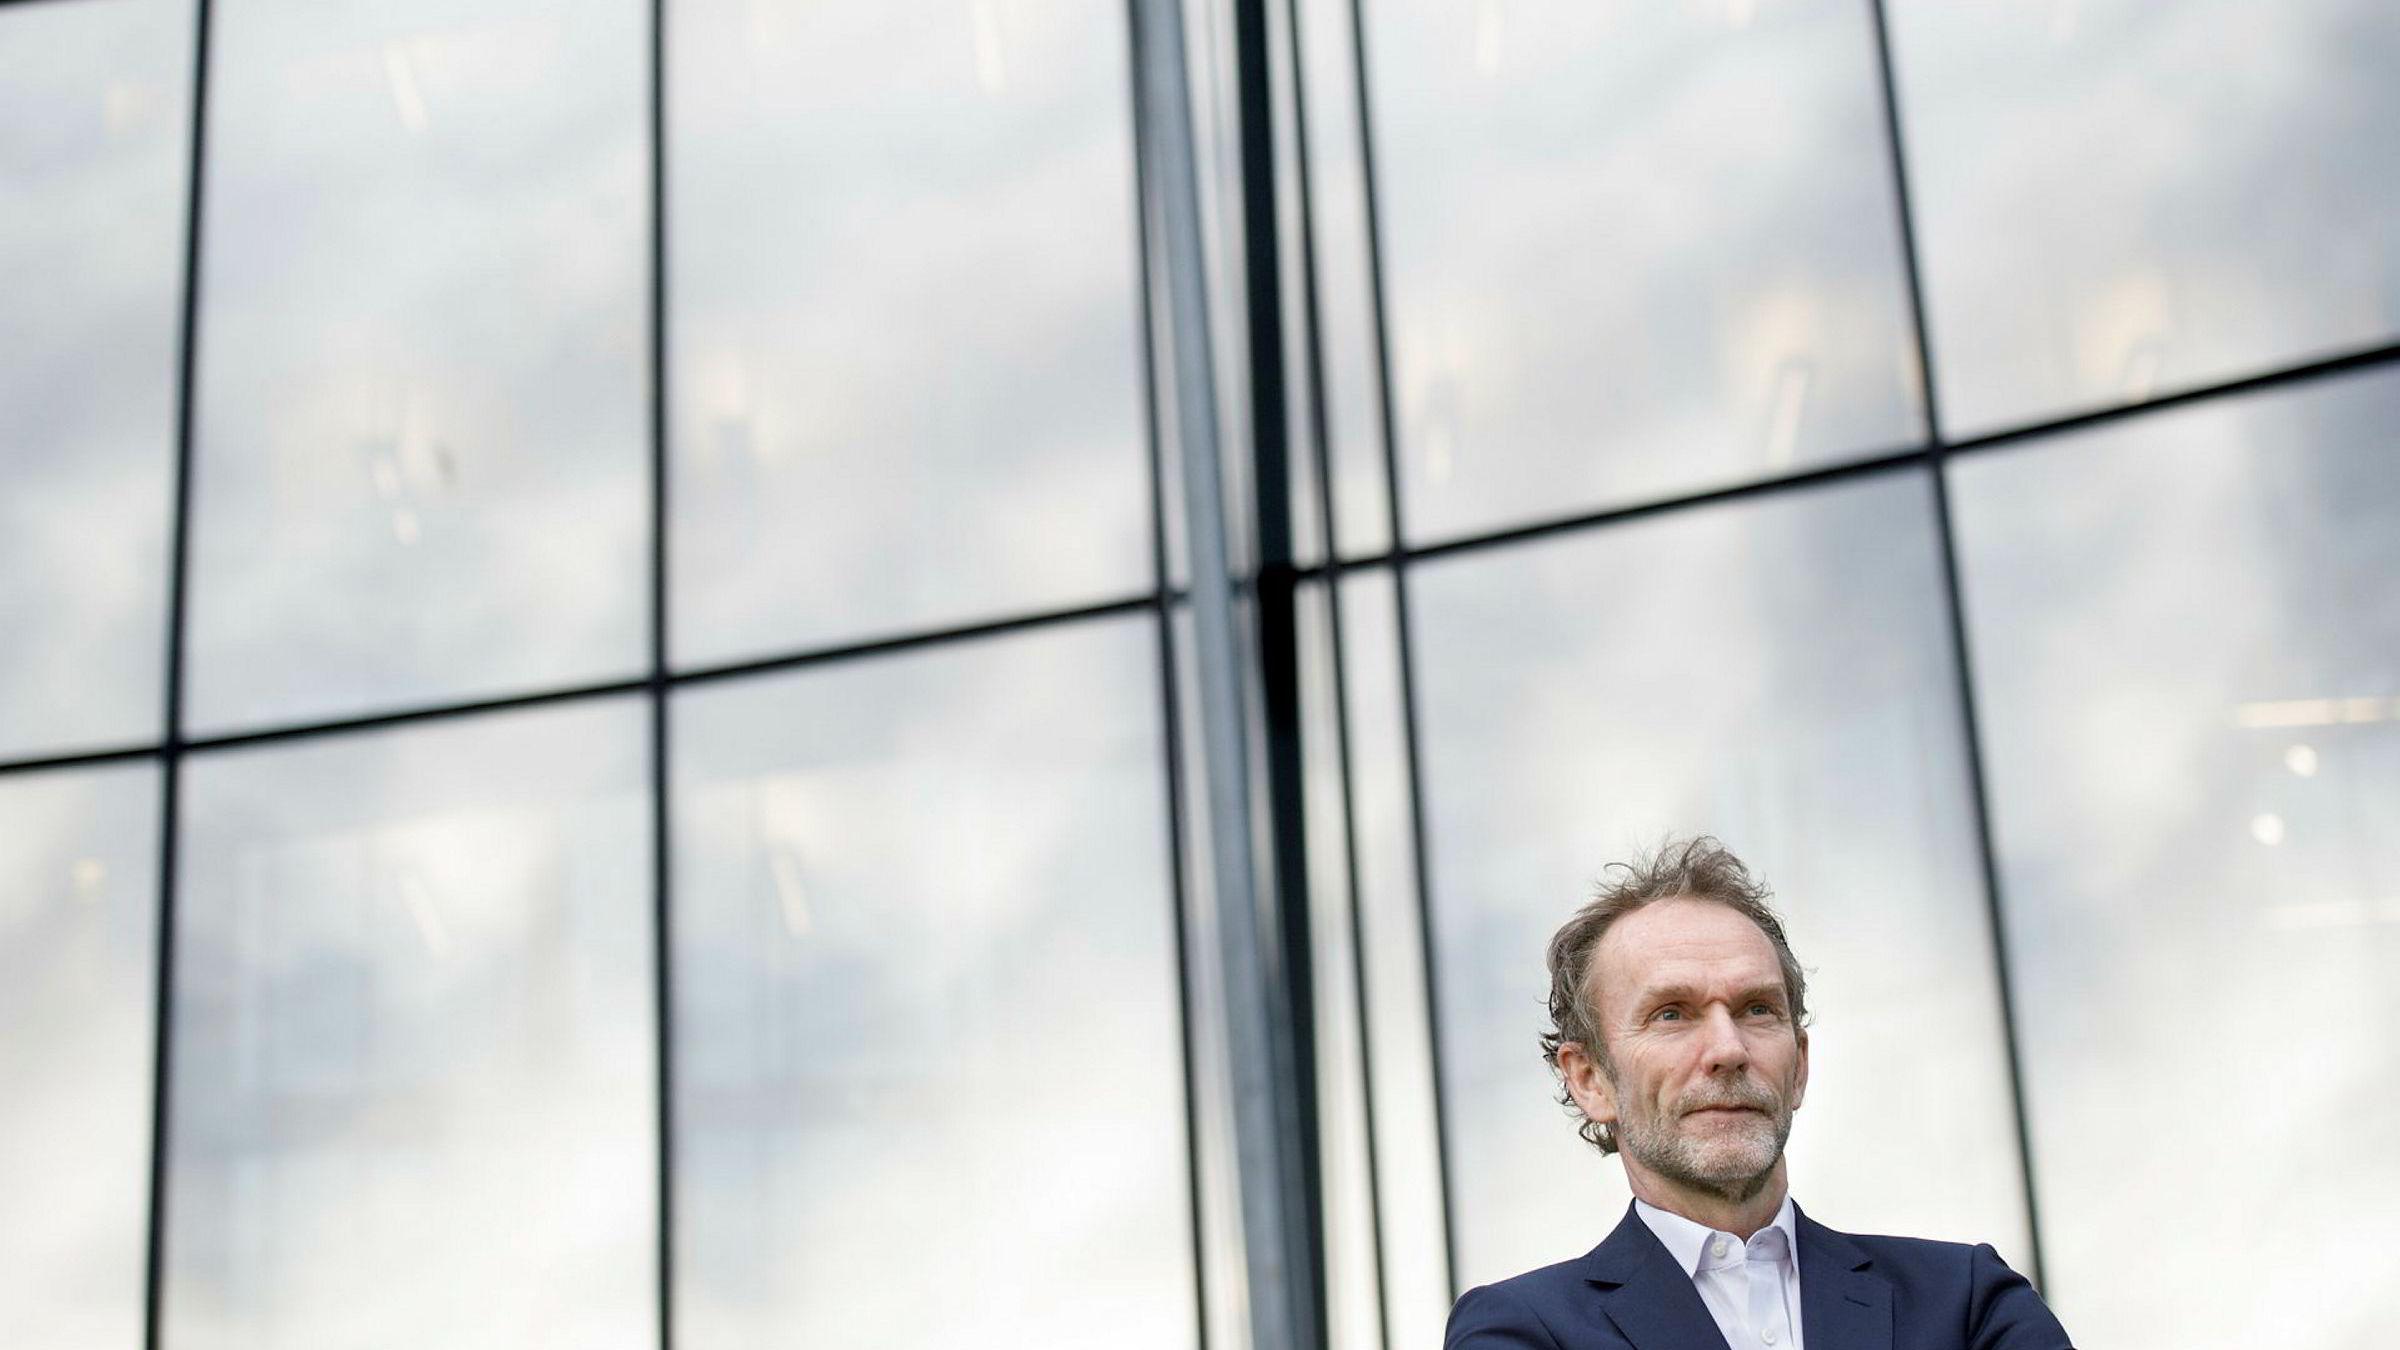 Sjeføkonom Harald Magnus Andreassen i Sparebank 1 Markets advarer om børsras.